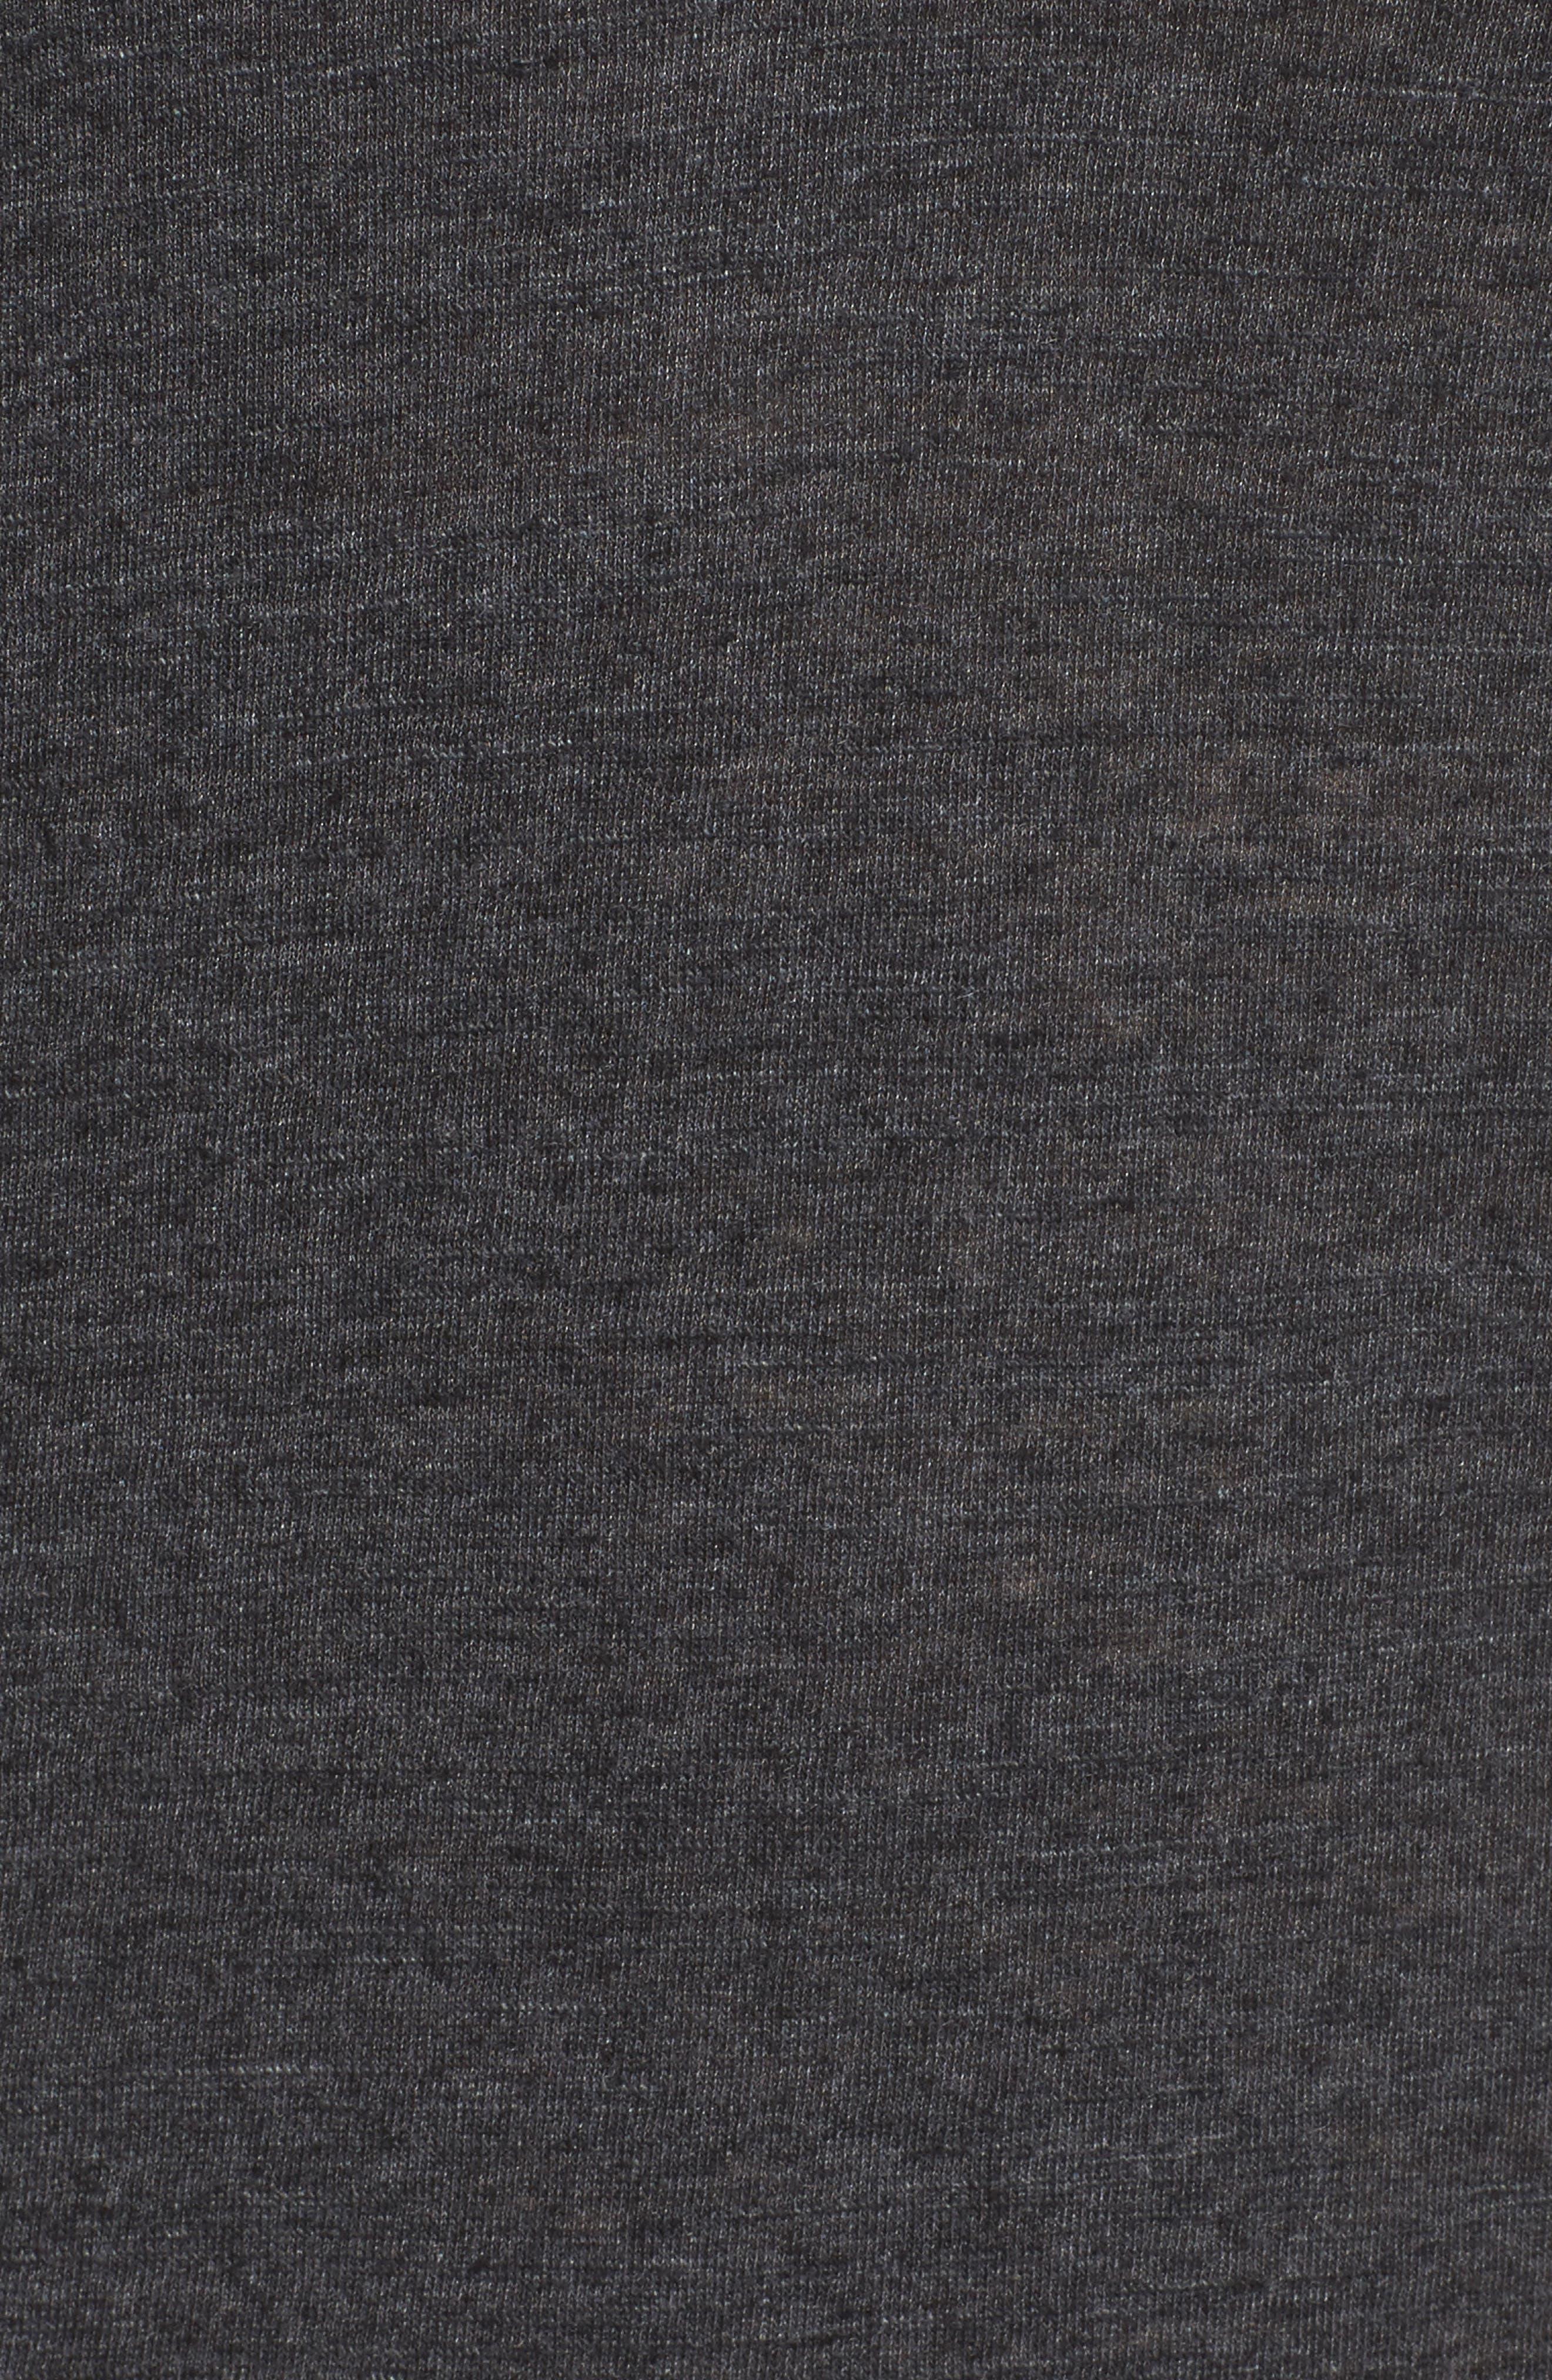 Tony Cutout Tee,                             Alternate thumbnail 6, color,                             Grey Dark Charcoal Heather